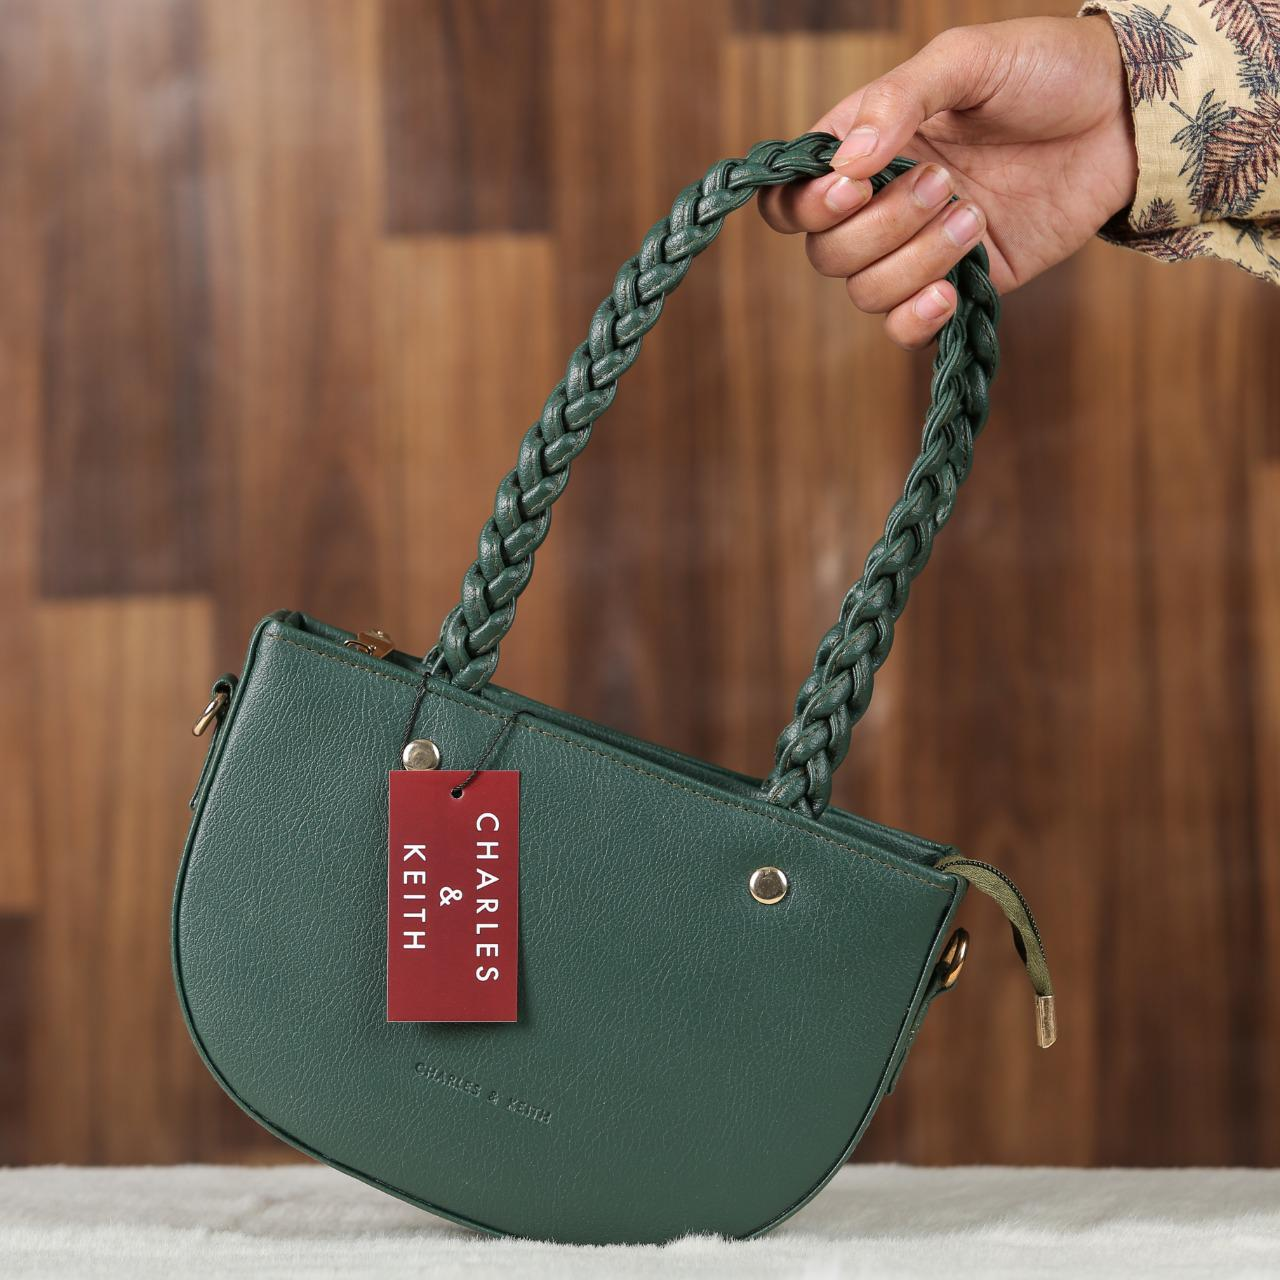 Charles & Keith Ladies Bag Green Color QB00134